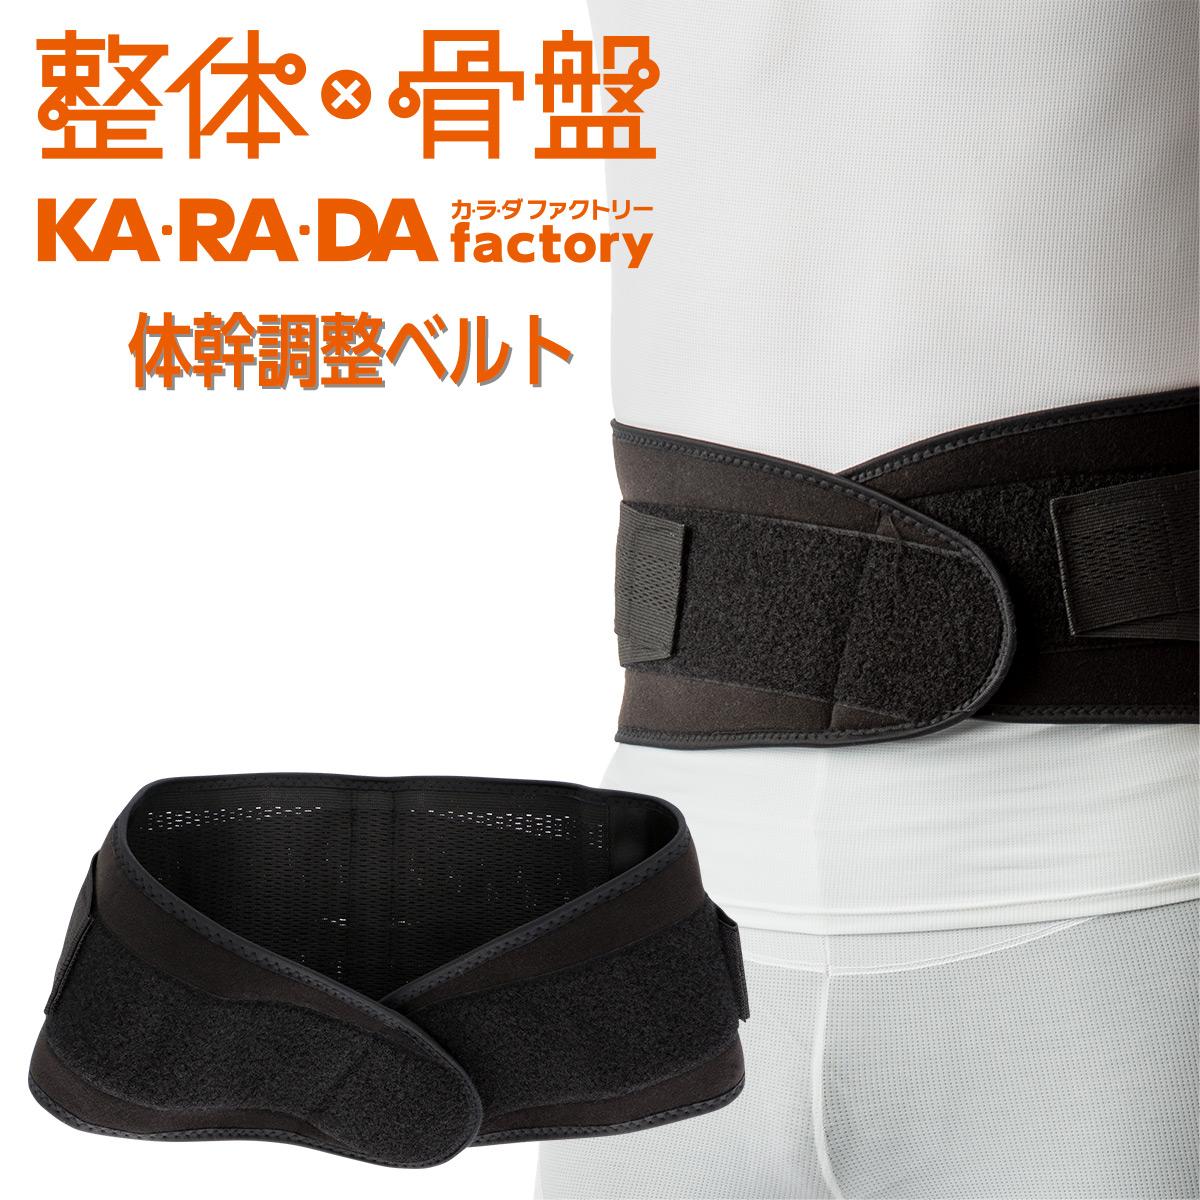 KARADAファクトリー(カラダファクトリー) 背骨すっきり 体幹安定ですっきりした立ち姿に 体幹調整ベルト メンズ 男性 紳士 2814-502 【ゆうパケットお取り扱い不可】